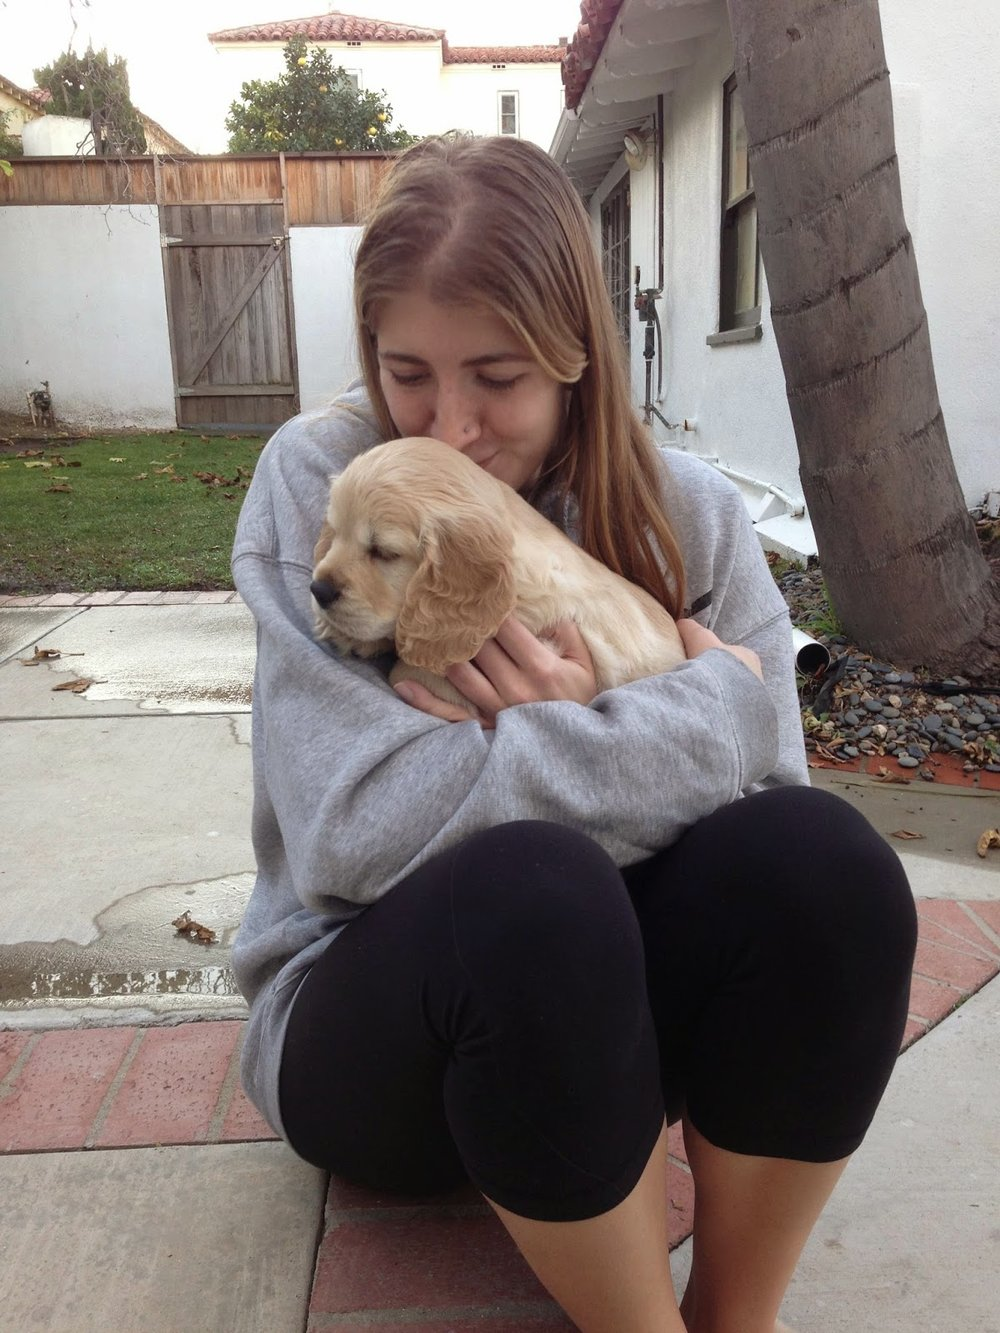 Beautiful Mallory with her puppy Kona.